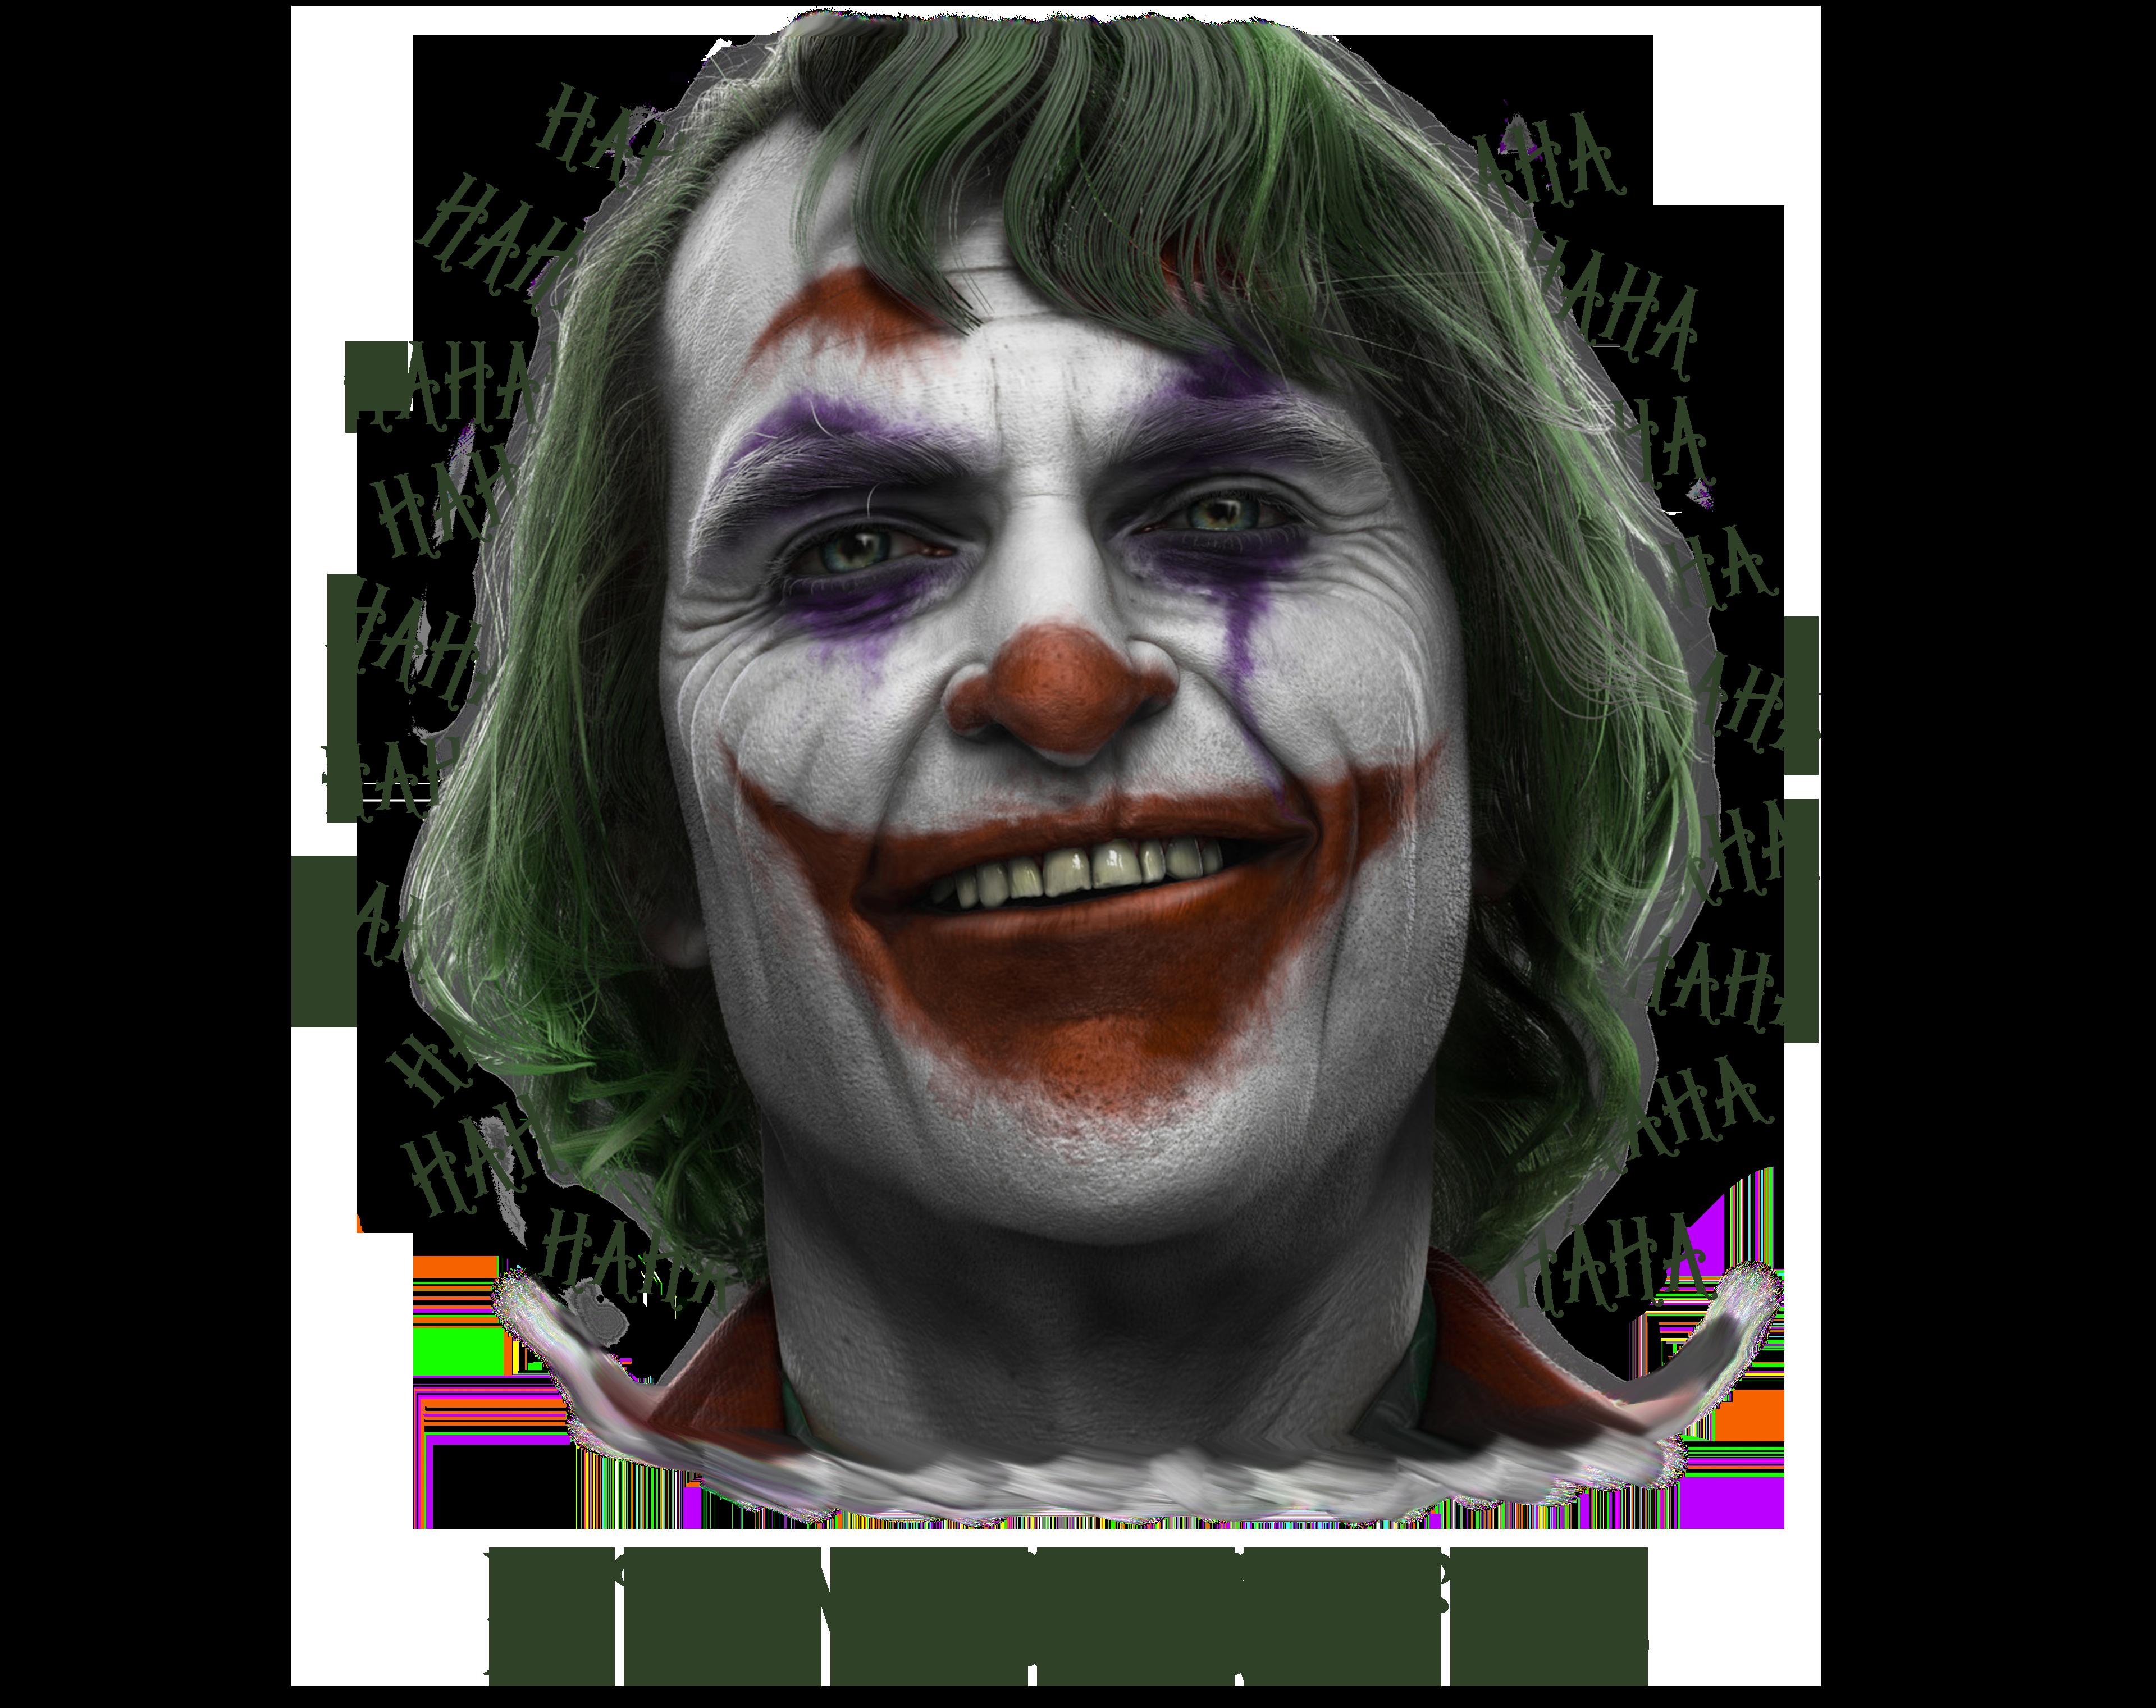 Happy Face Joker Smile Png Best Tattoo Ideas